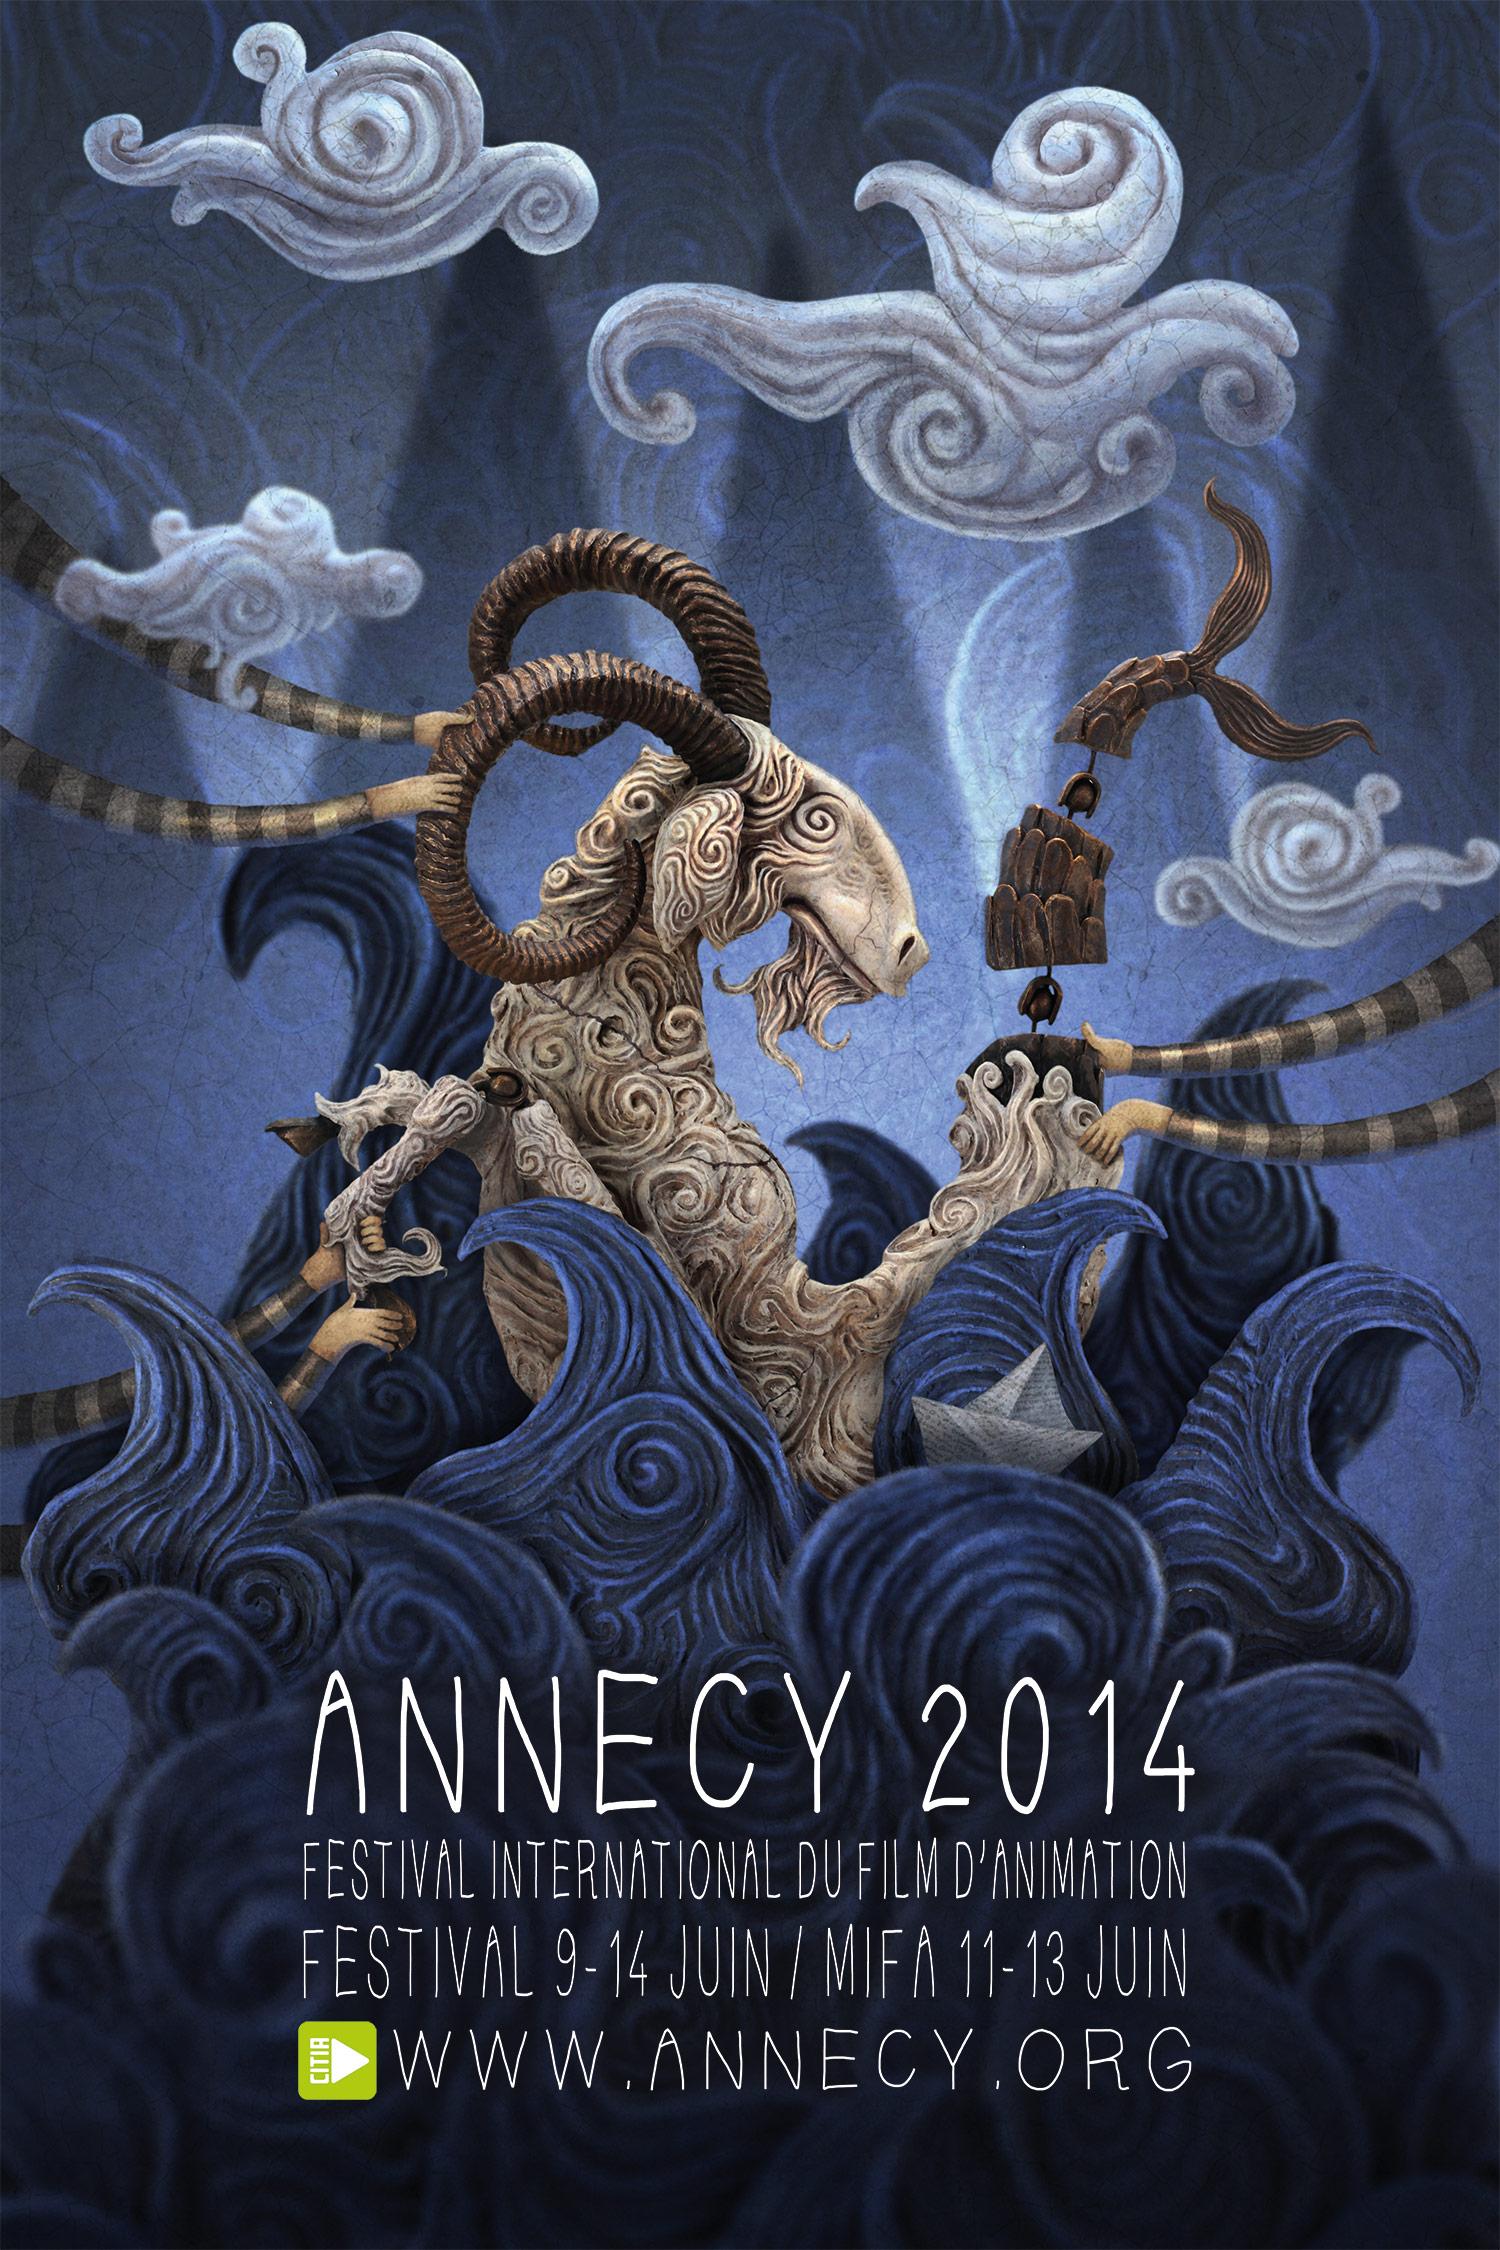 annecy-international-animation-festival-9-14-june-2014